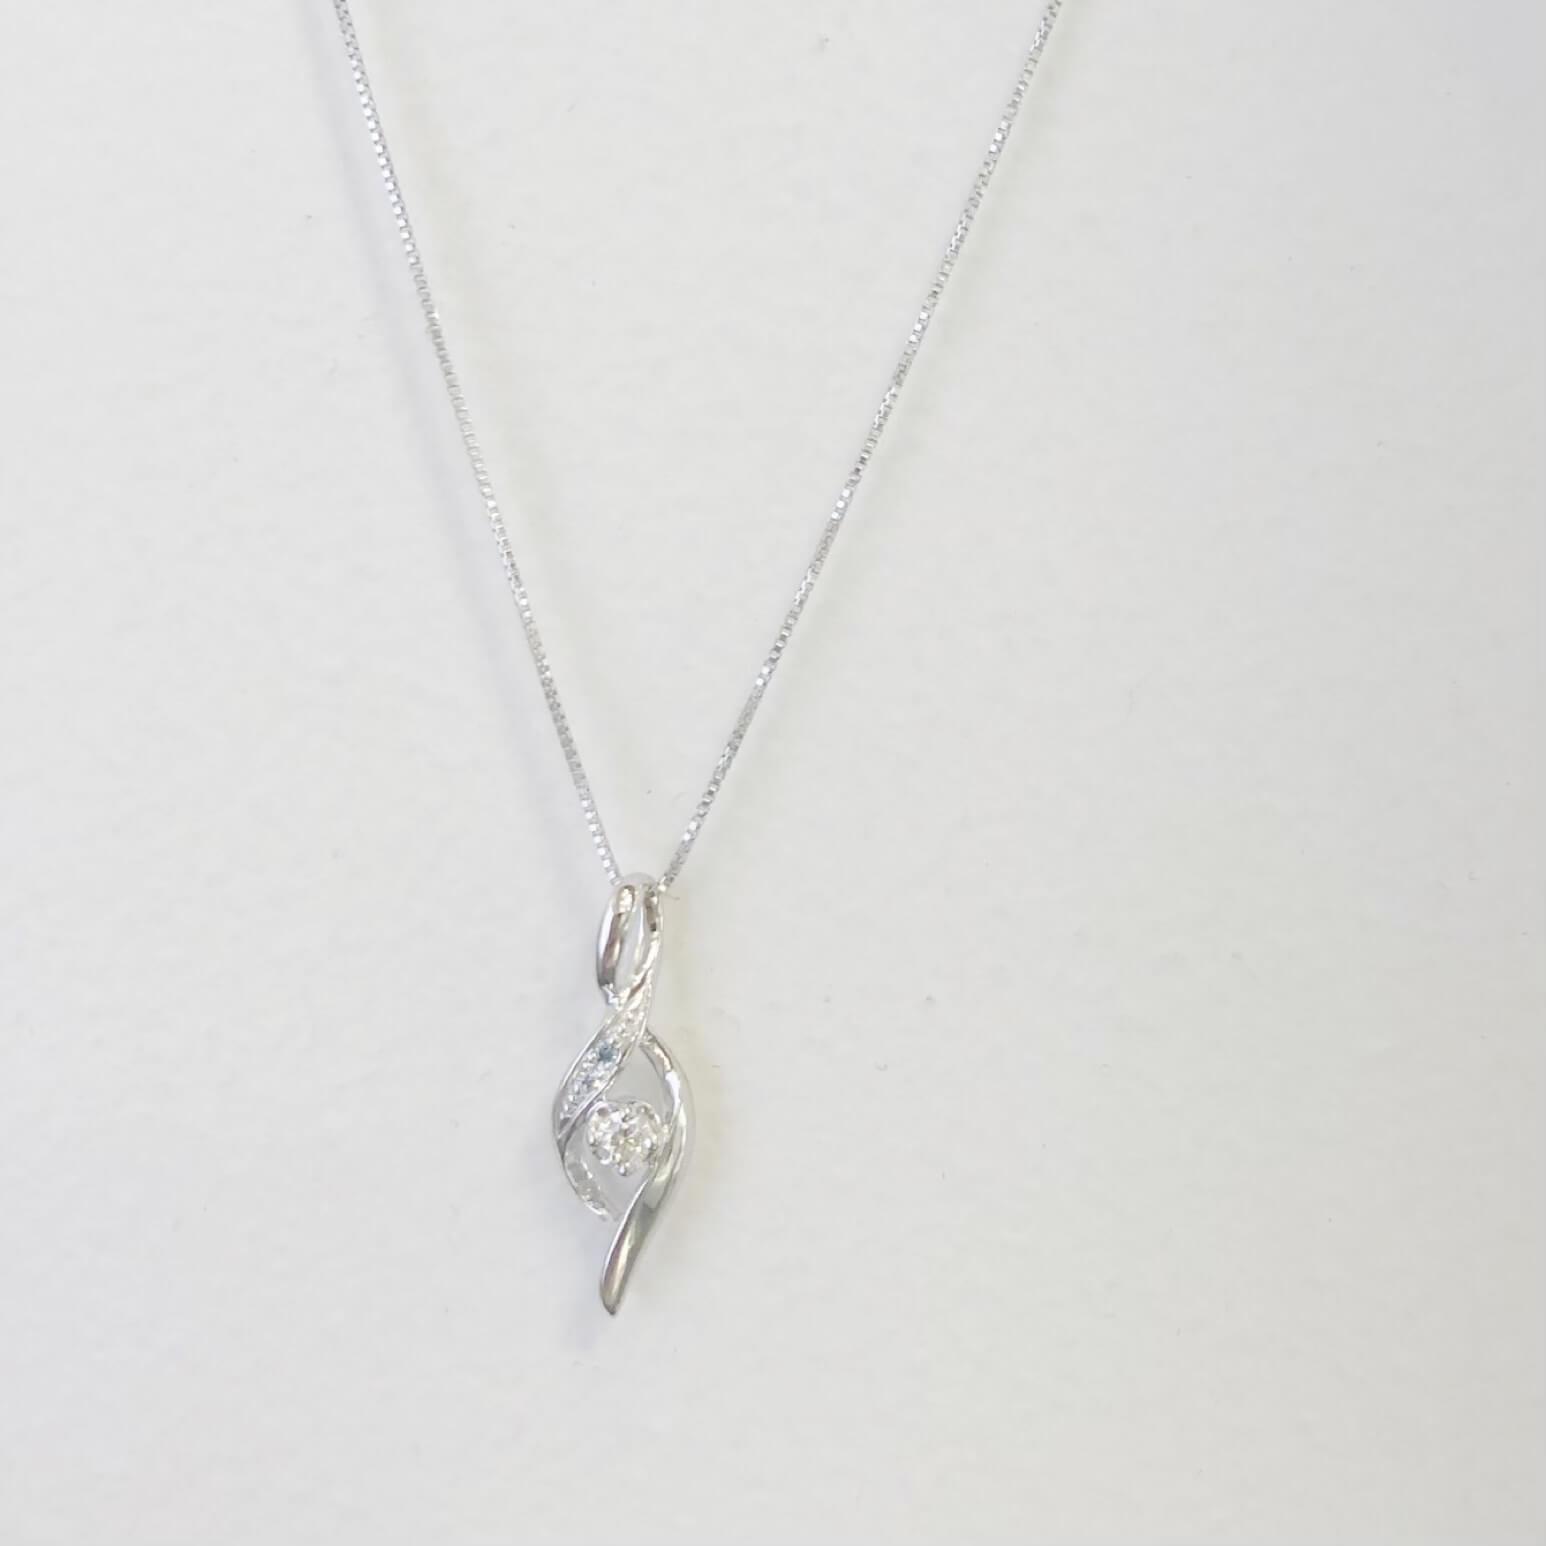 K10WG H&Cダイヤモンドネックレス